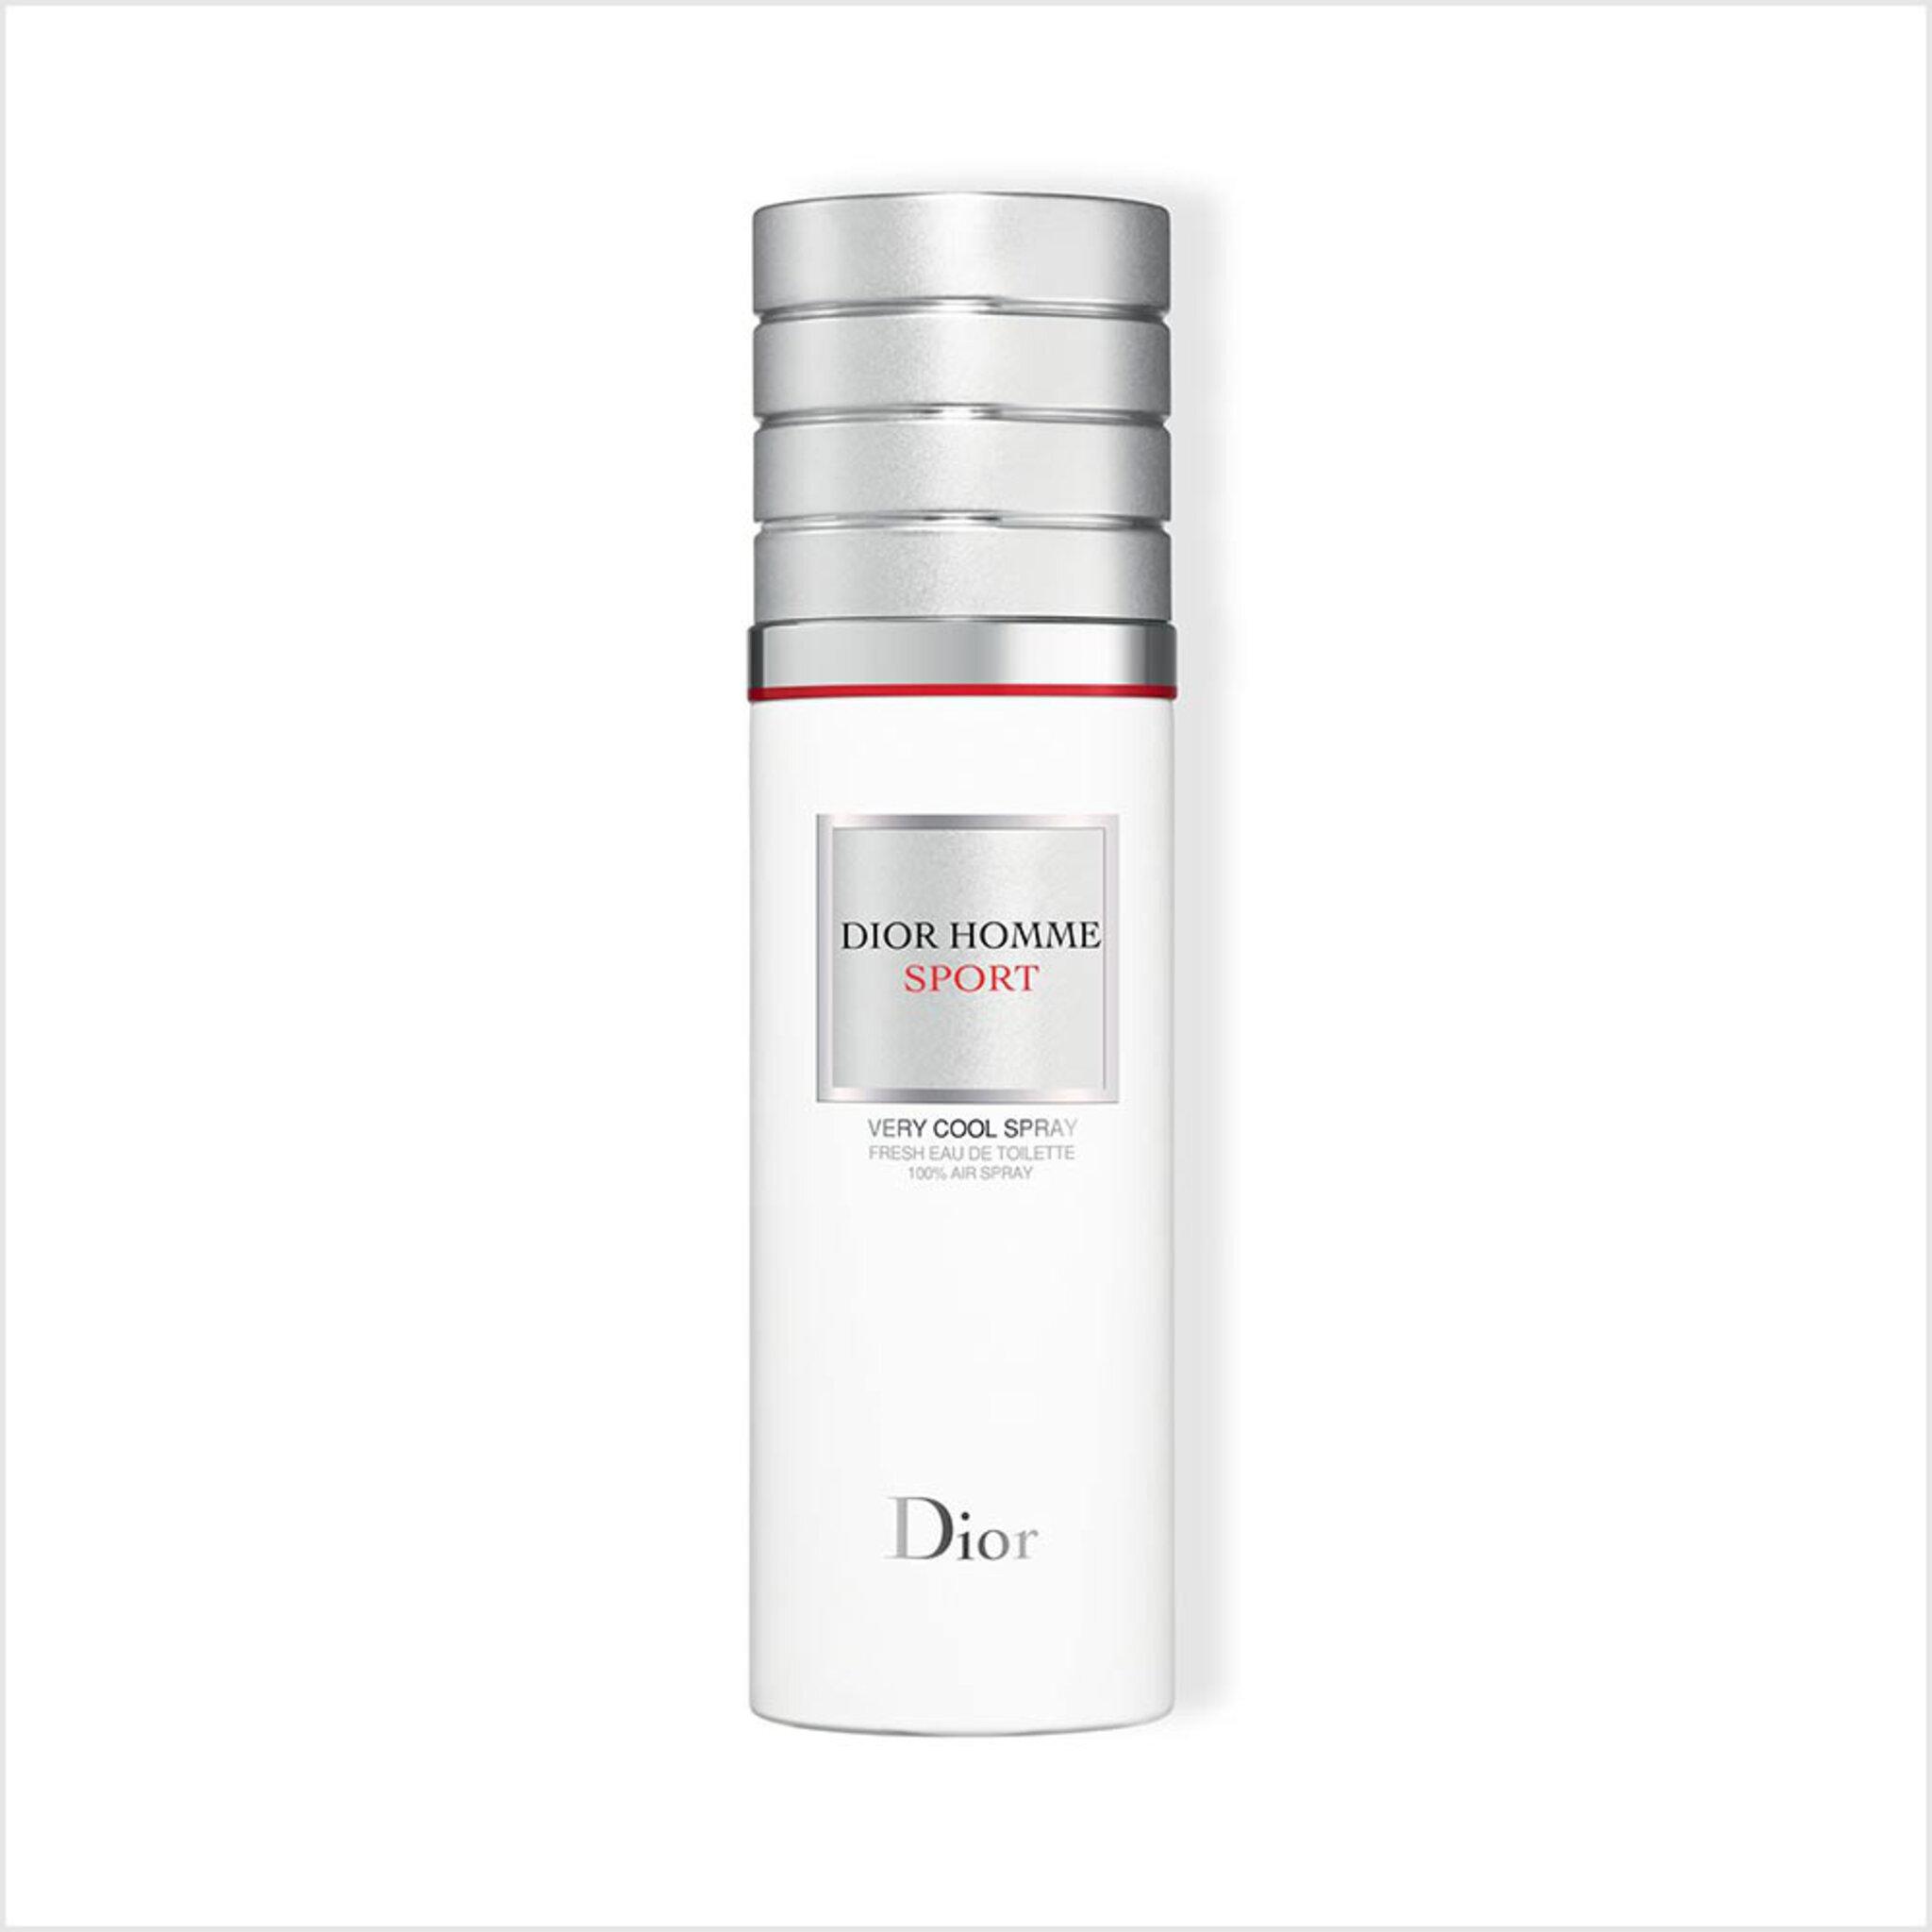 Dior Homme Sport Very Cool Spray Edt , 100 ML